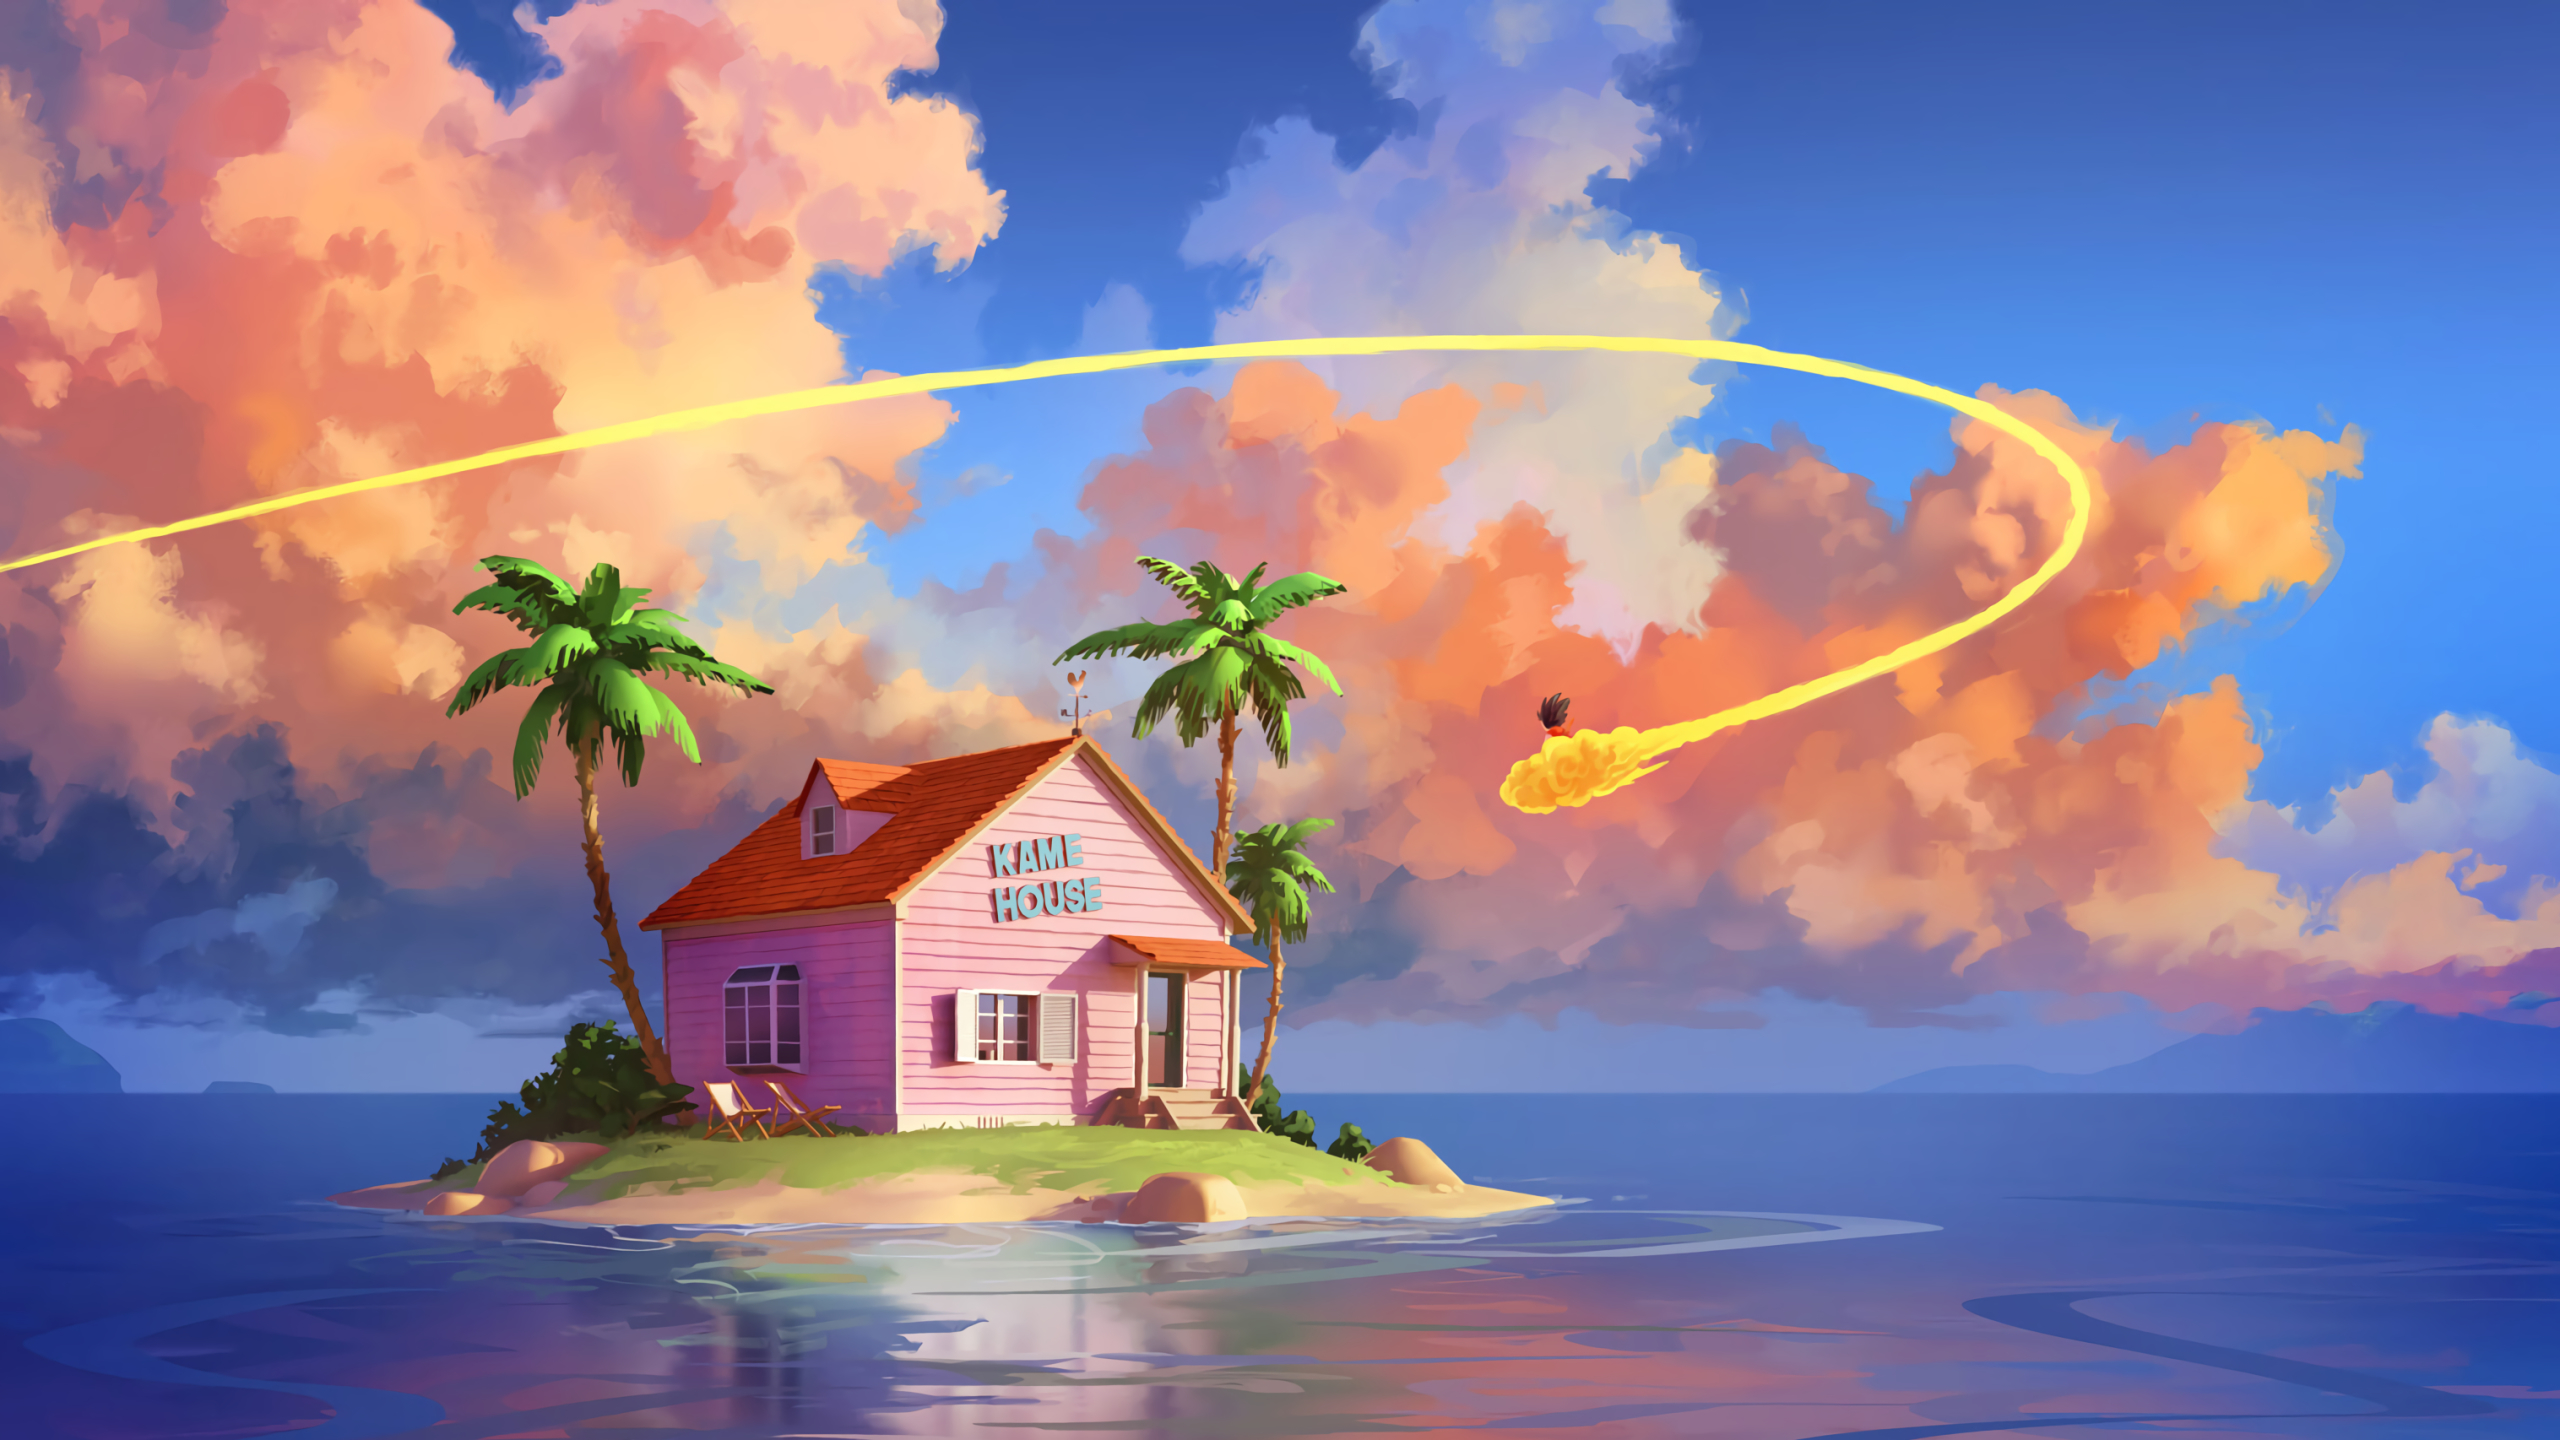 2560x1440 Kame House Dragon Ball Z 1440P Resolution ...